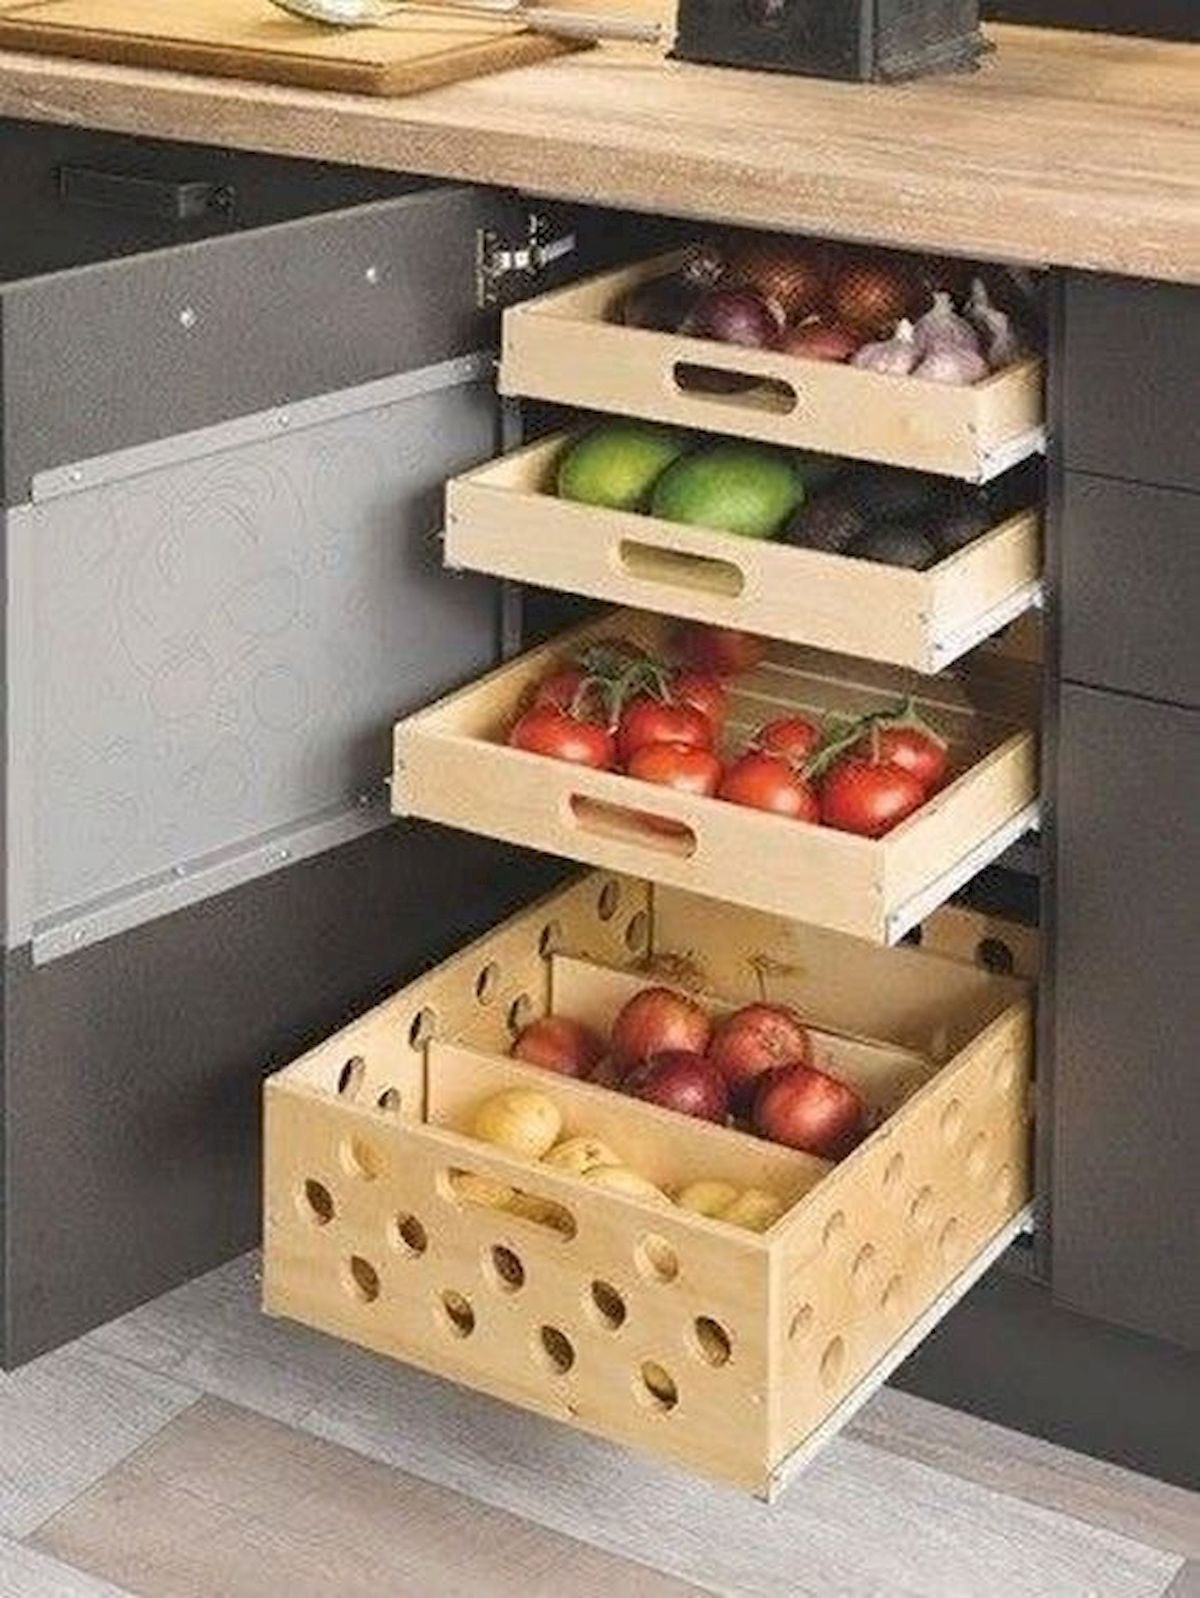 30 creative diy kitchen storage ideas for fruit and vegetable 20 in 2020 diy kitchen storage on kitchen organization layout id=41992